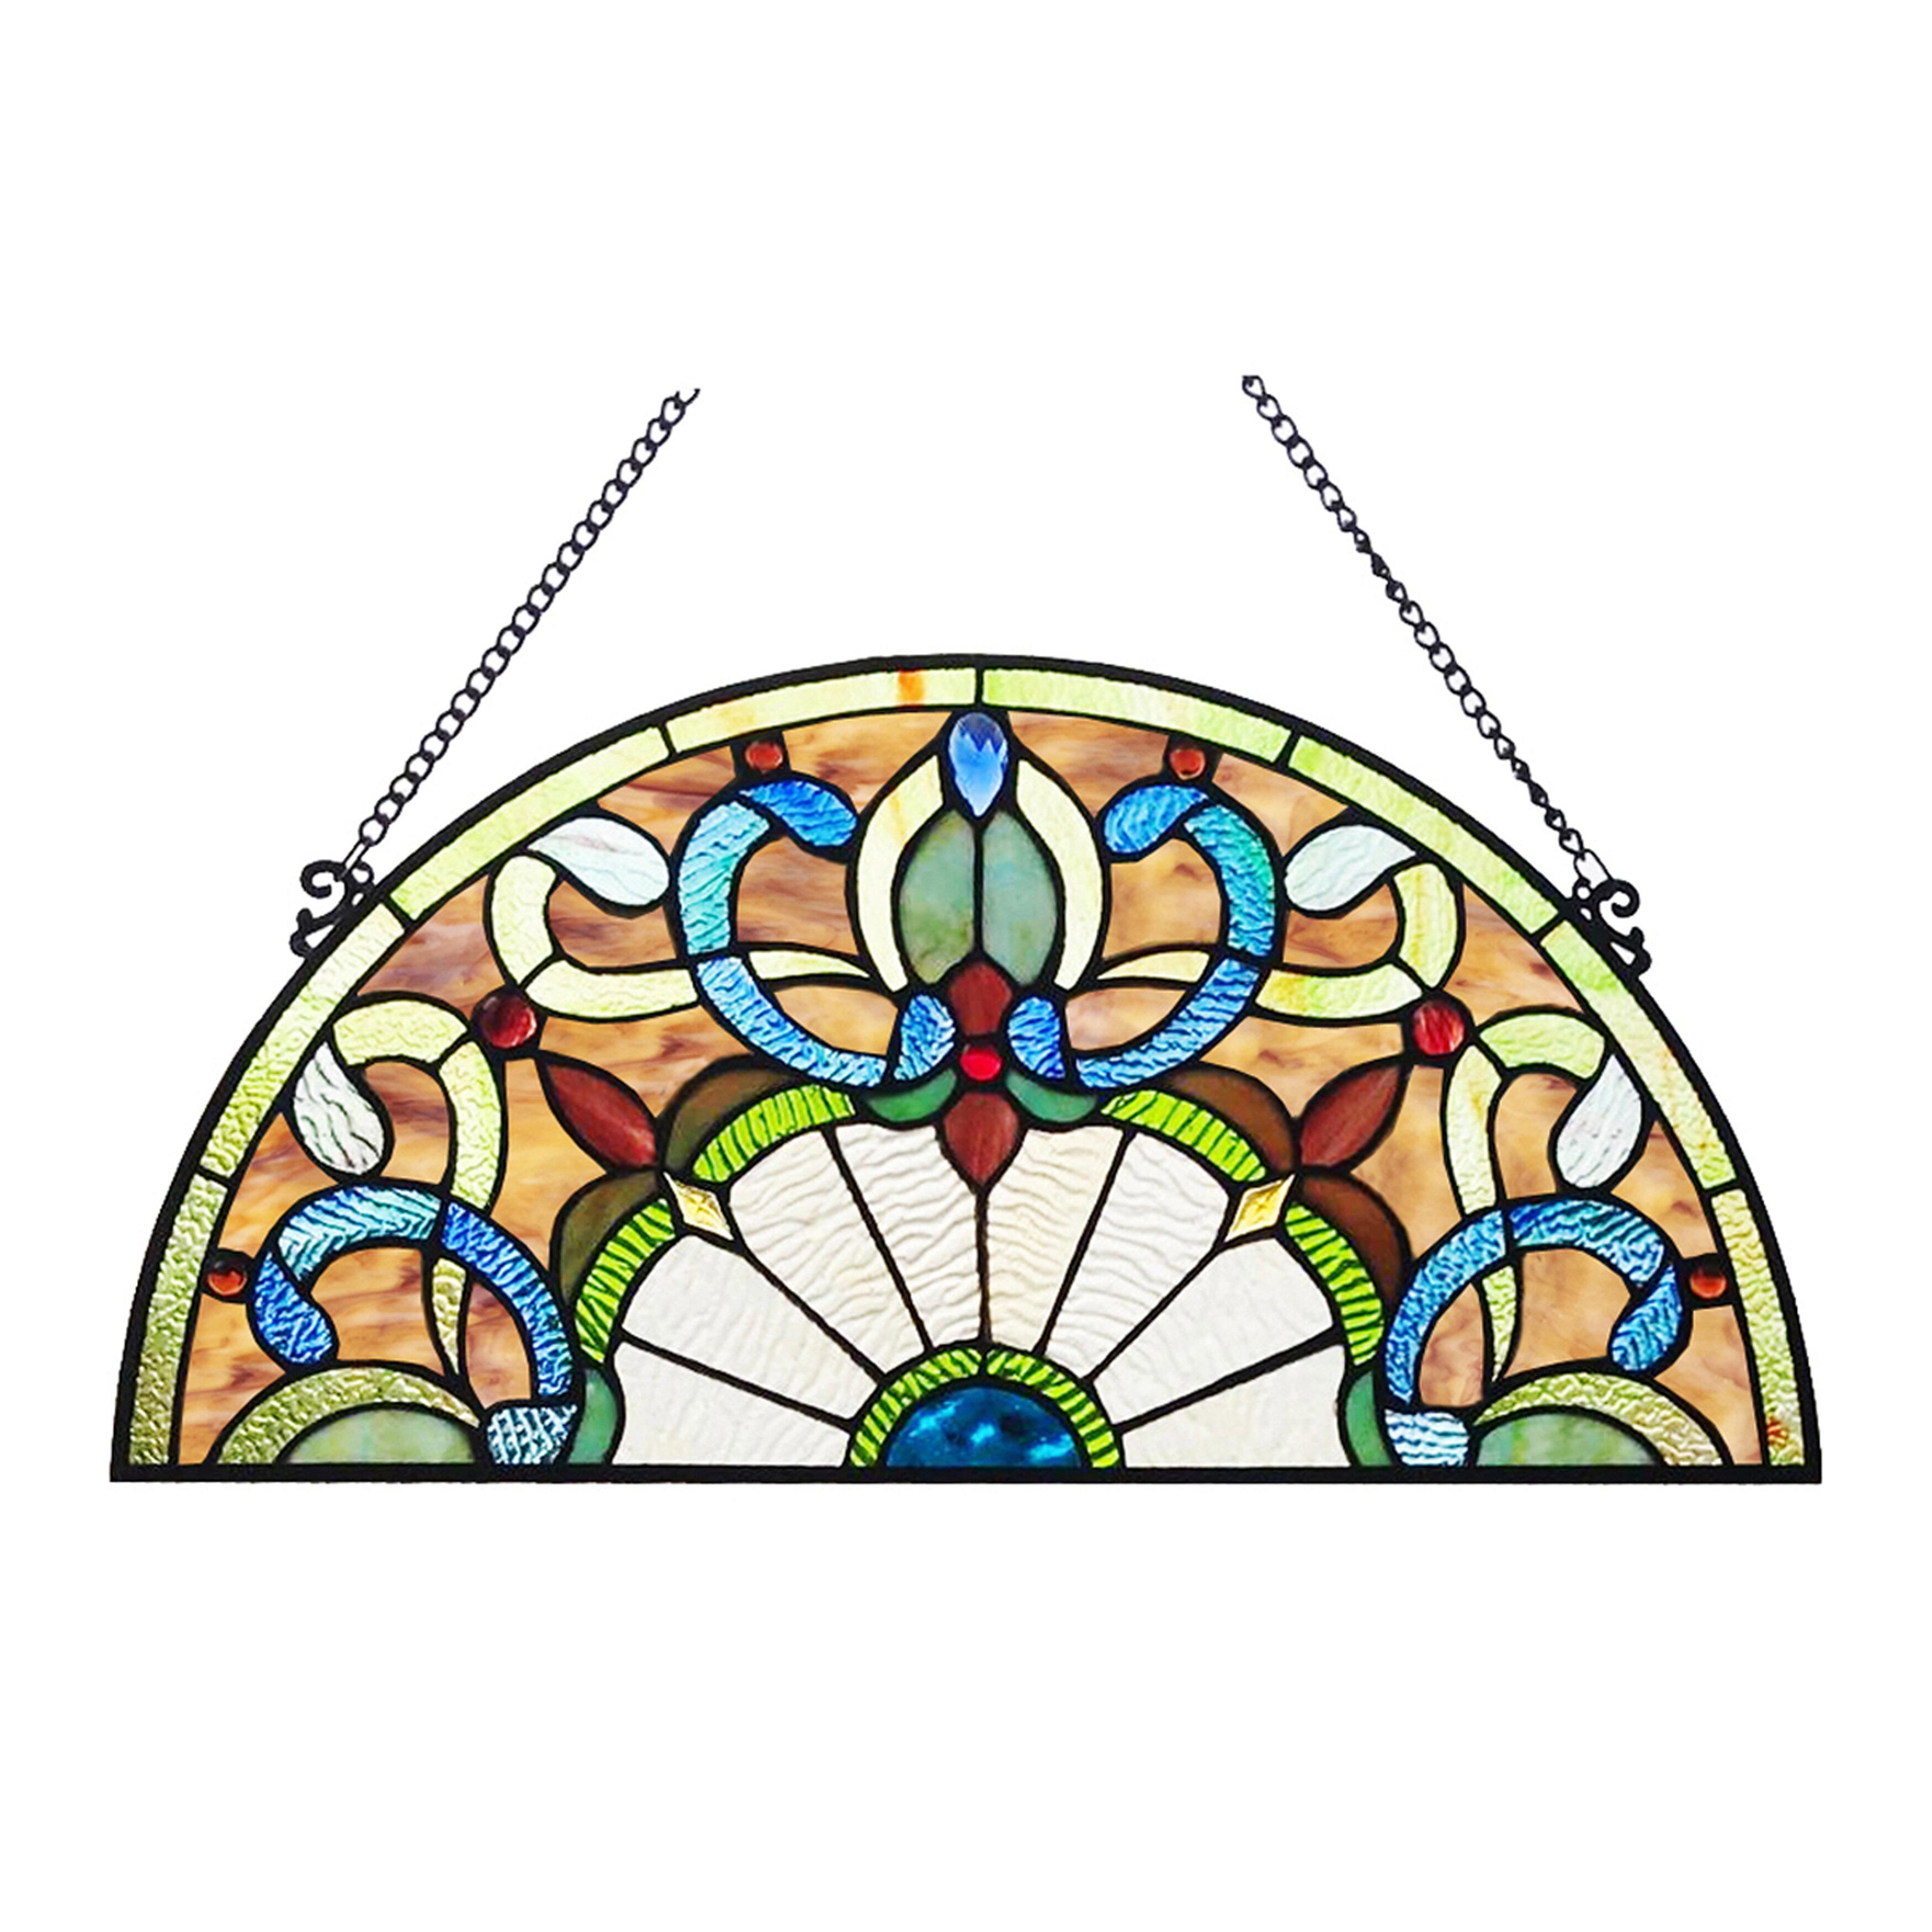 Astoria Grand Corista Half Moon Stained Glass Window Panel Reviews